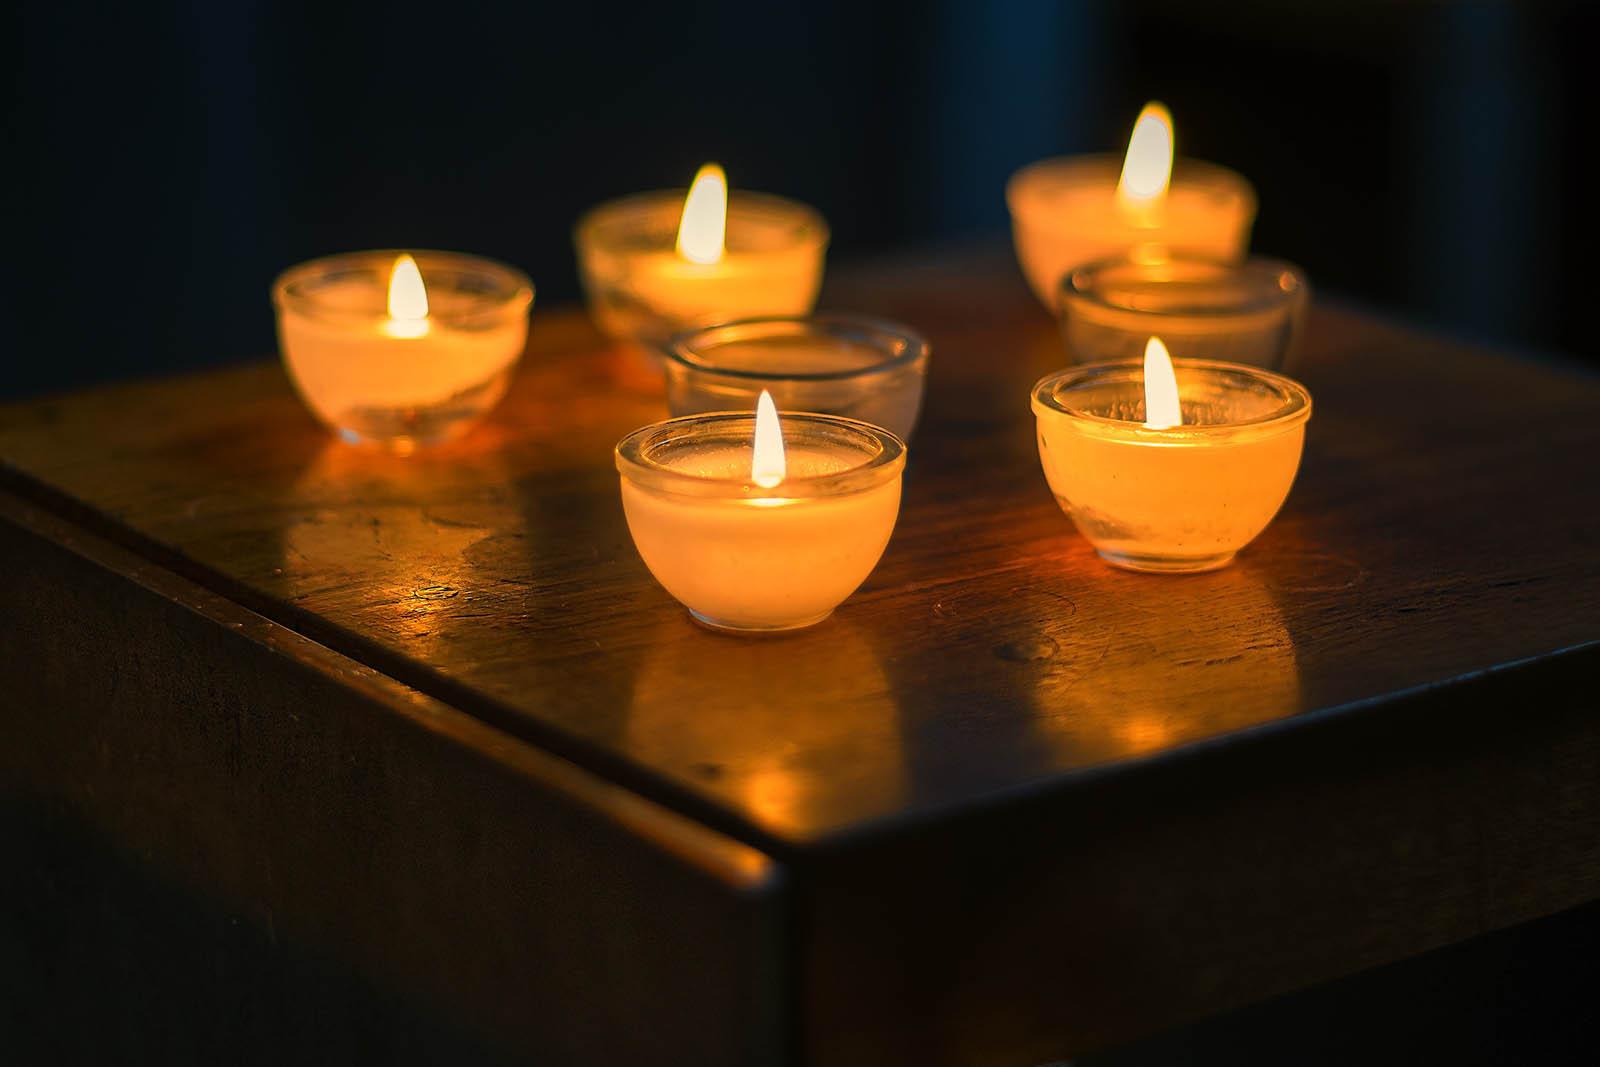 Life Threads Ceremonies | Funeral Celebrant, Abegael Fisher-Lang